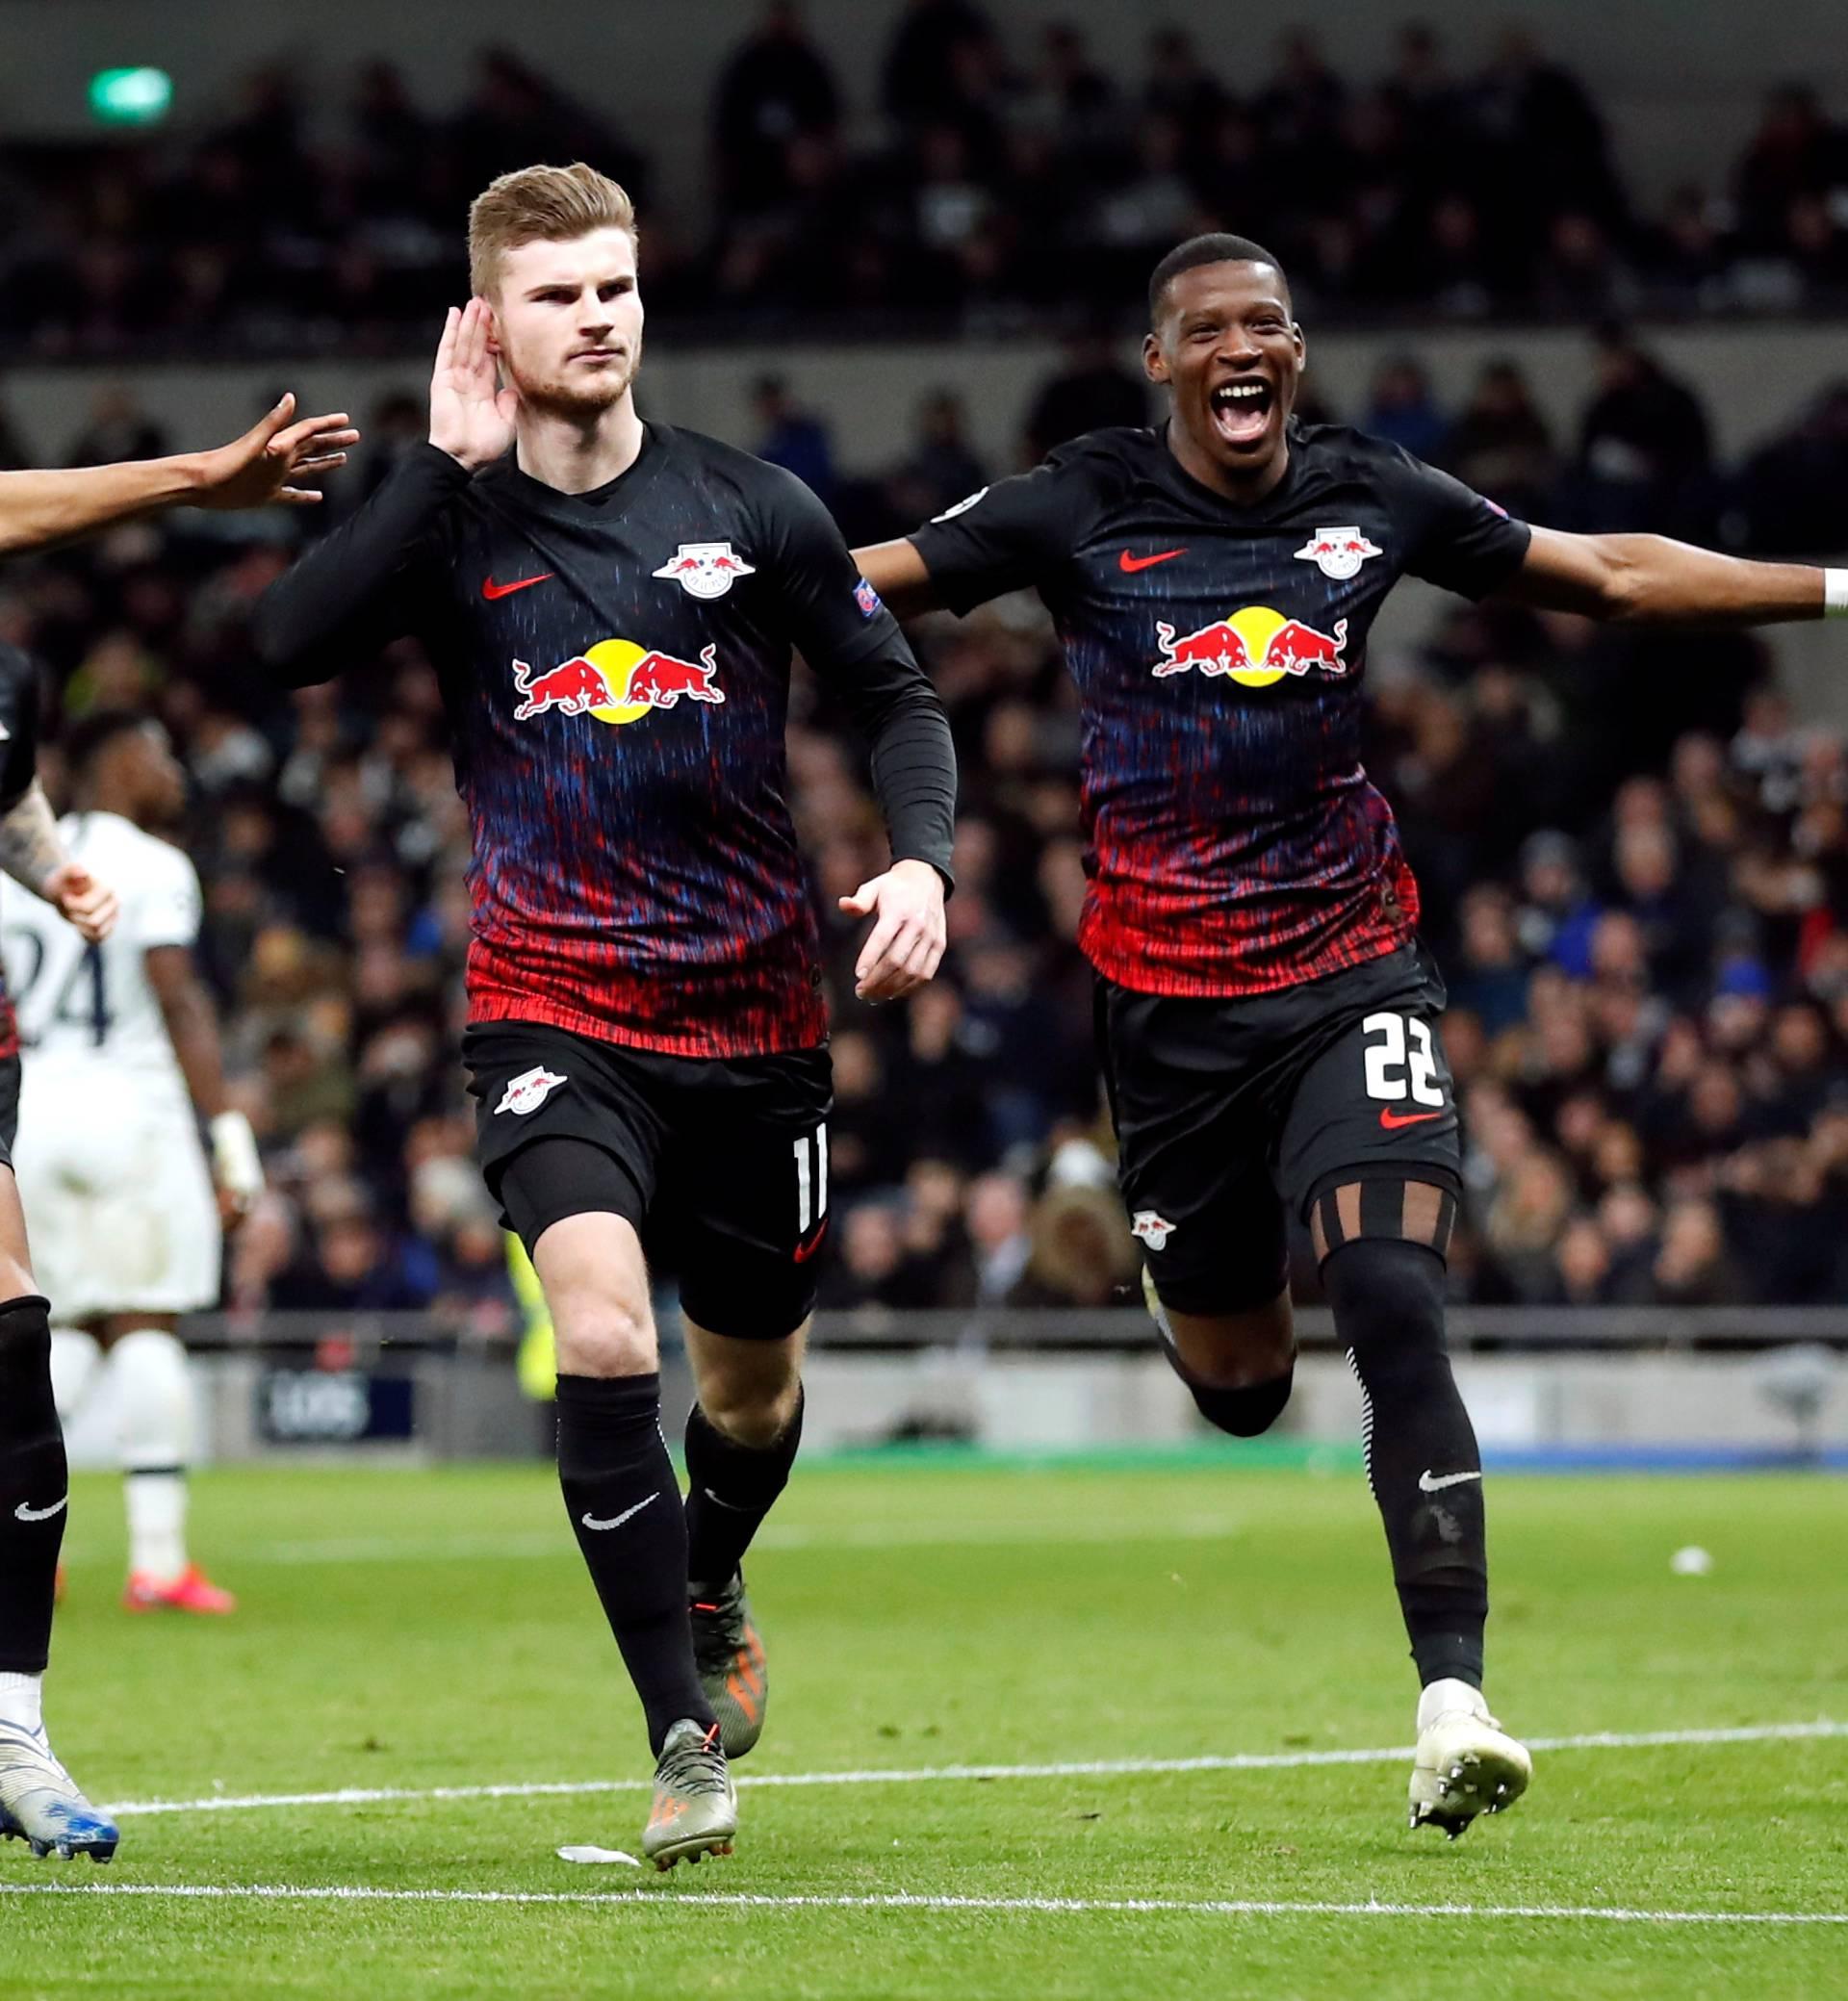 Champions League - Round of 16 First Leg - Tottenham Hotspur v RB Leipzig